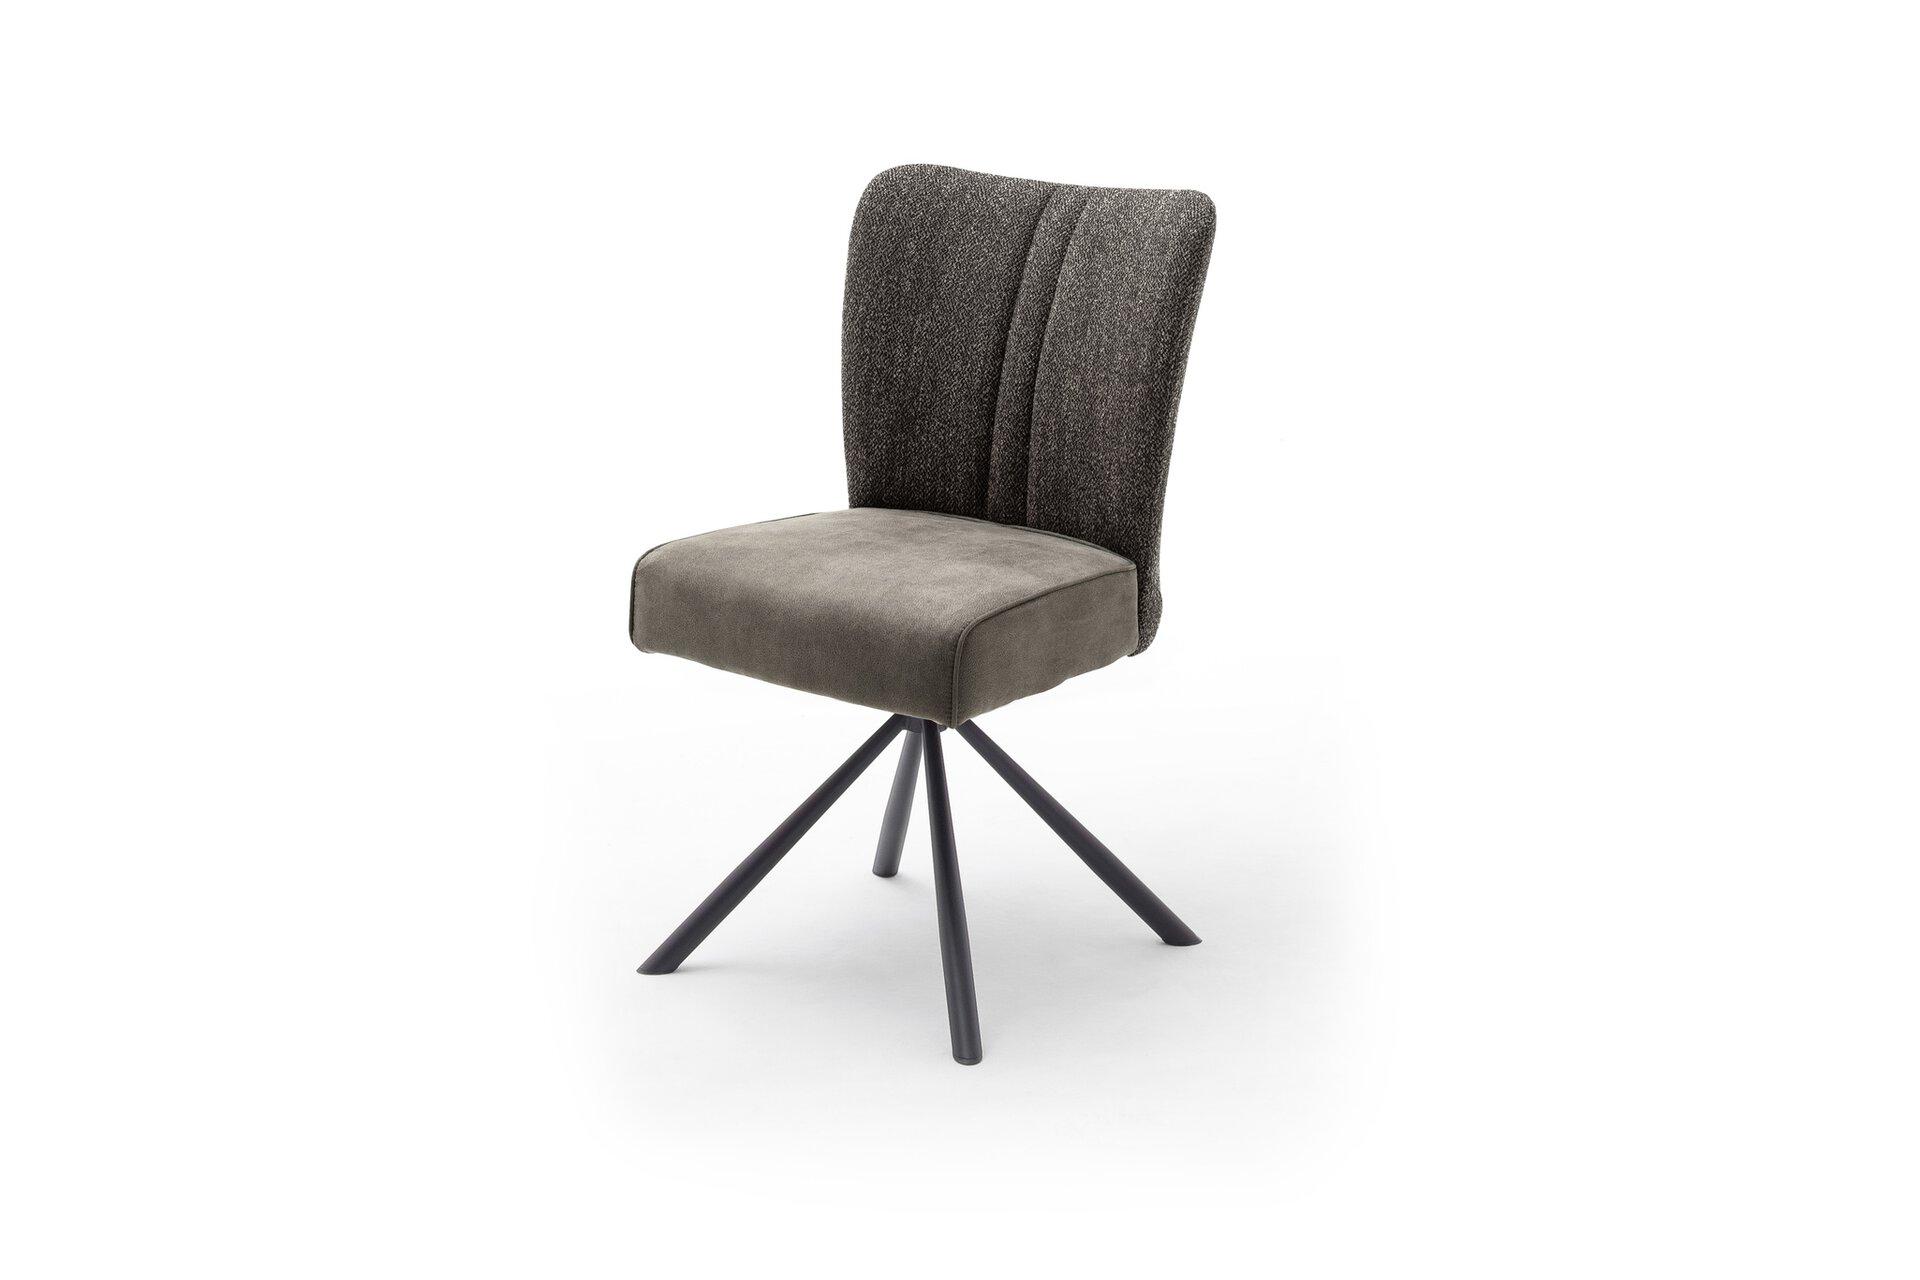 Stuhl HOMER Vito Textil grau 62 x 55 x 53 cm